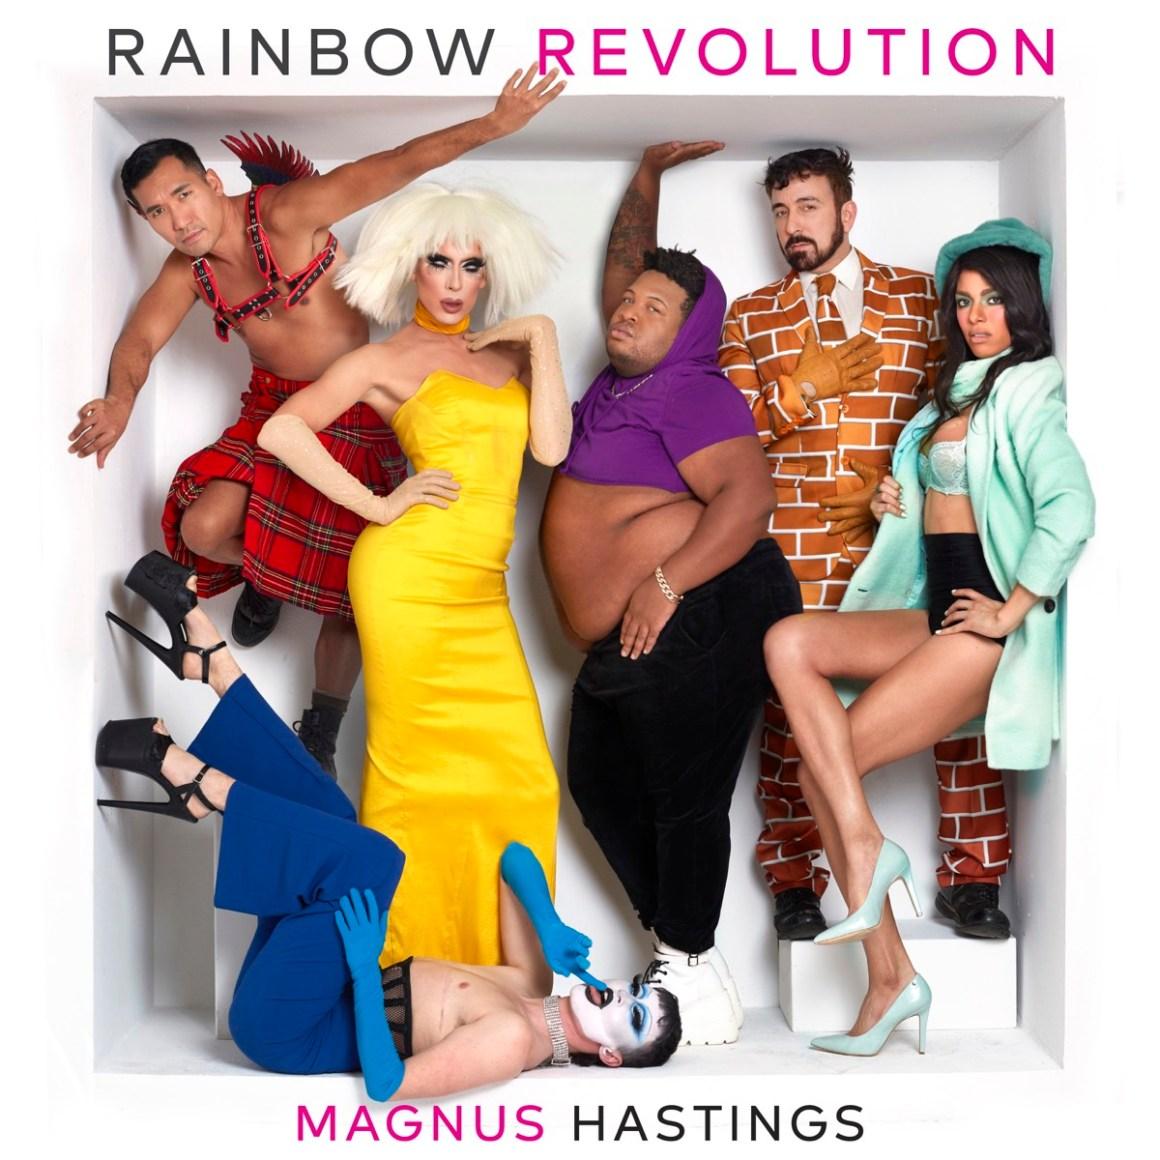 Magnus Hastings' Rainbow Revolution book